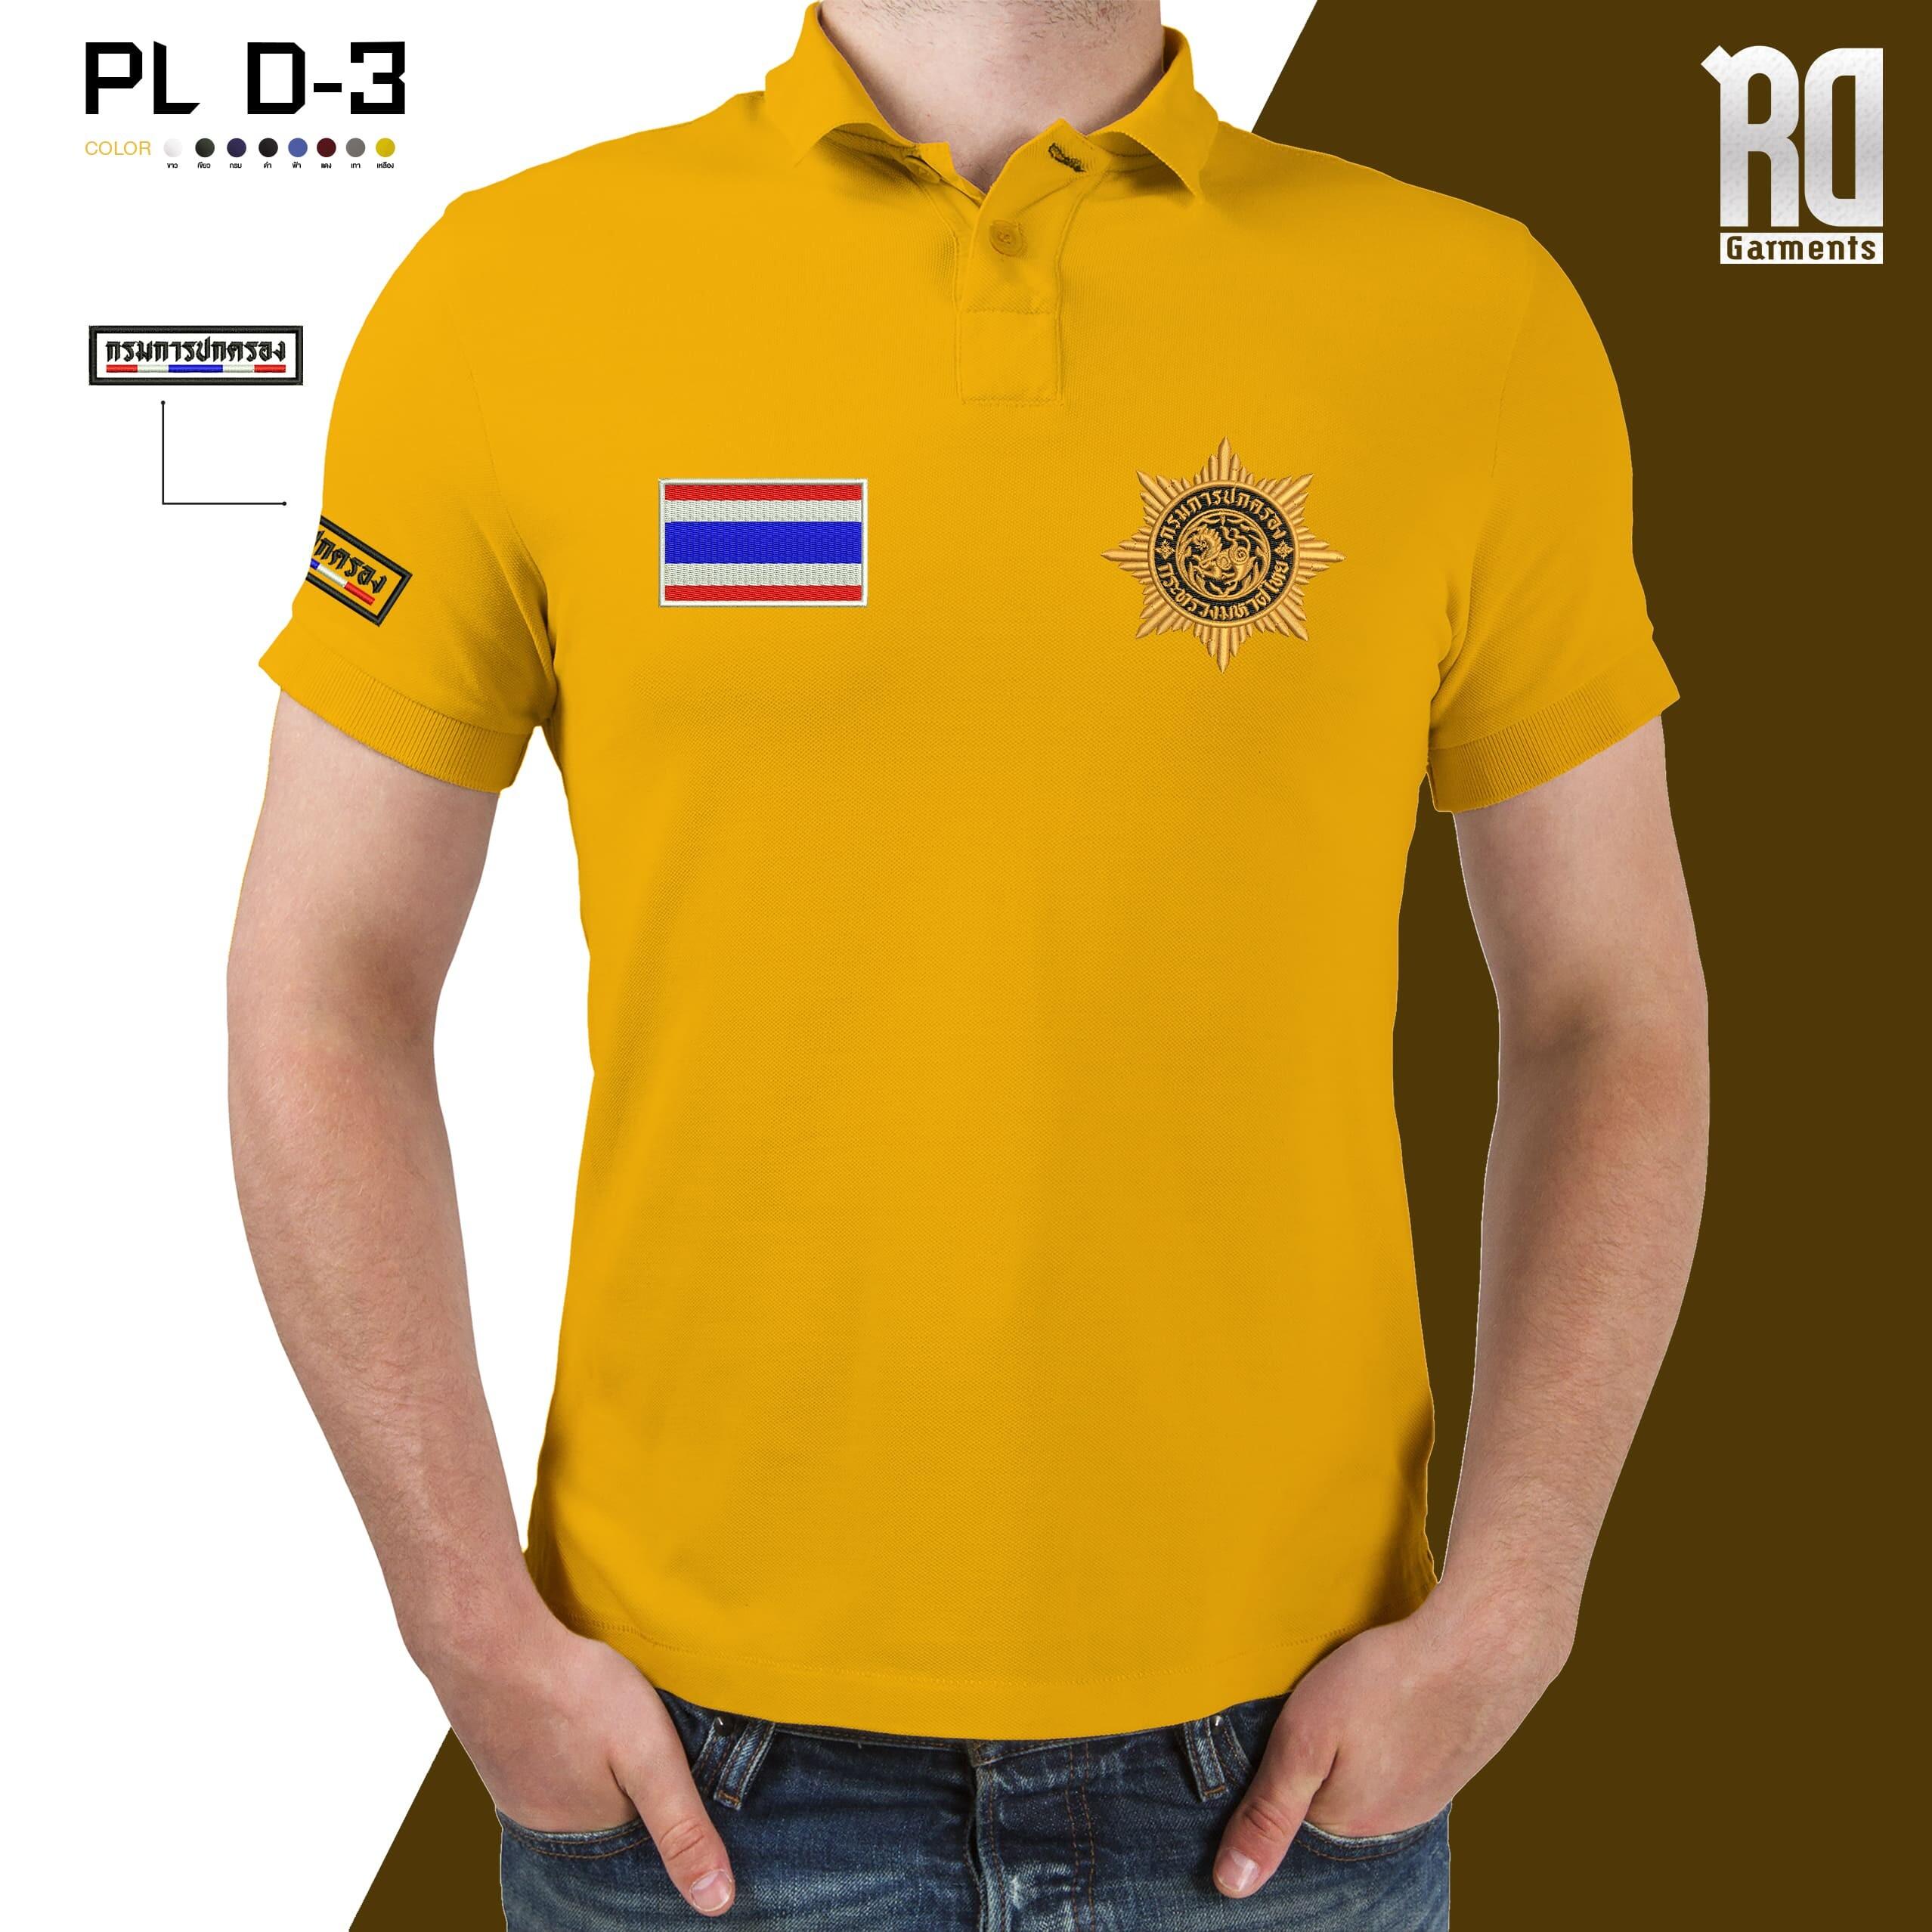 PL D-3 เสื้อโปโลกรมการปกครอง งานปัก